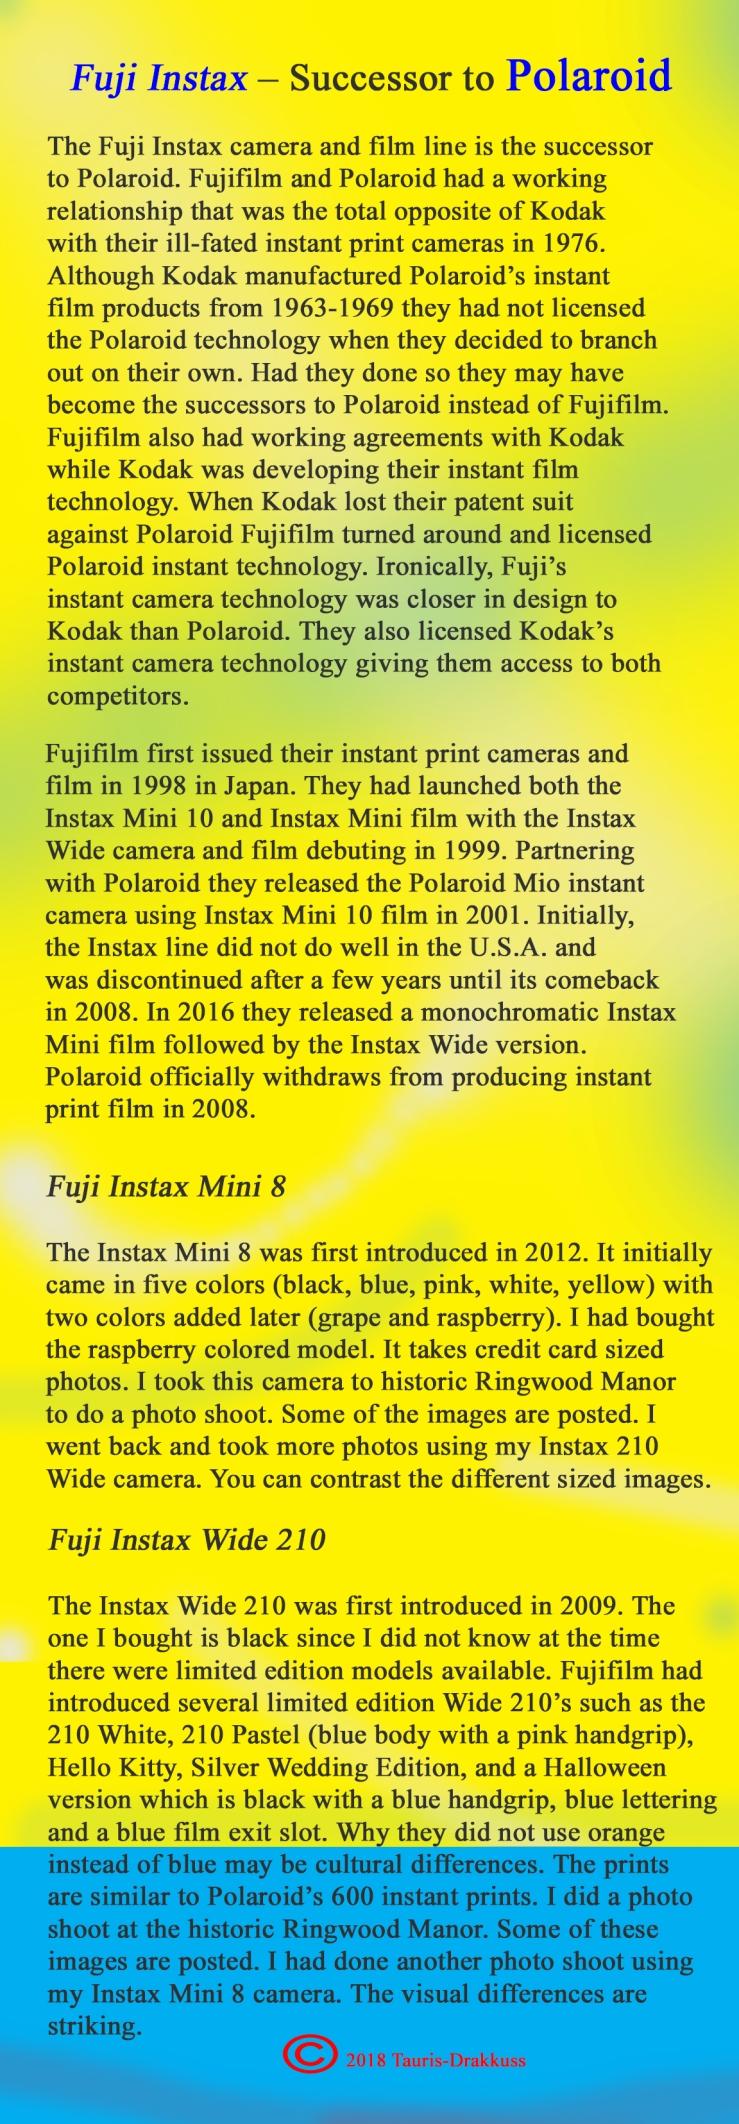 Fuji Instax Background - Final